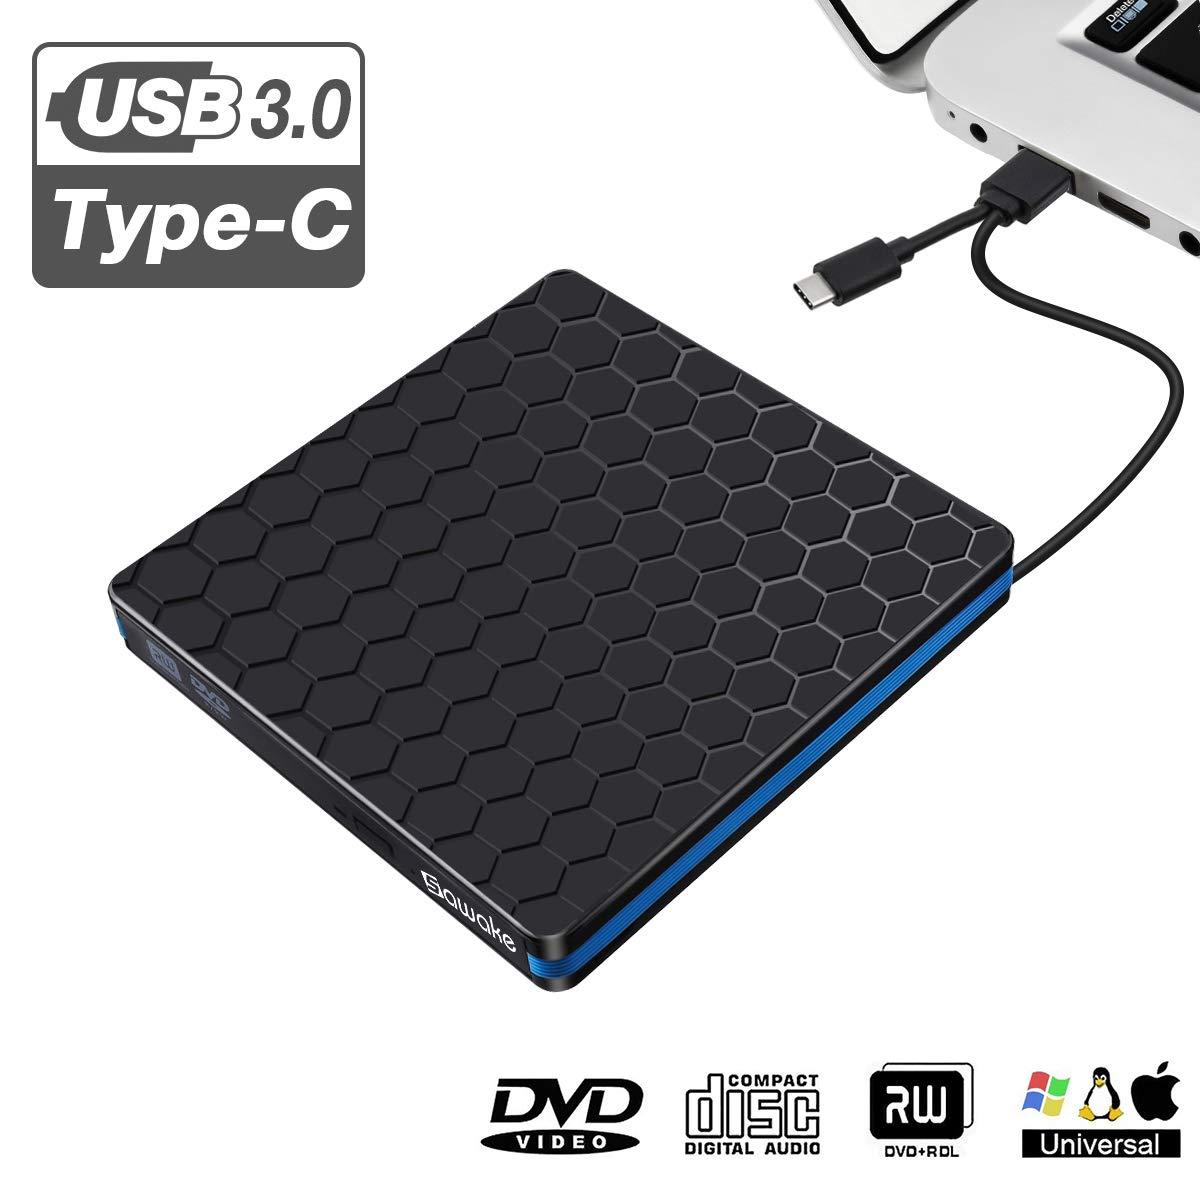 Externes DVD CD Laufwerk 3.0 USB-A & USB-C, SAWAKE DVD Player PC für 12.99 €